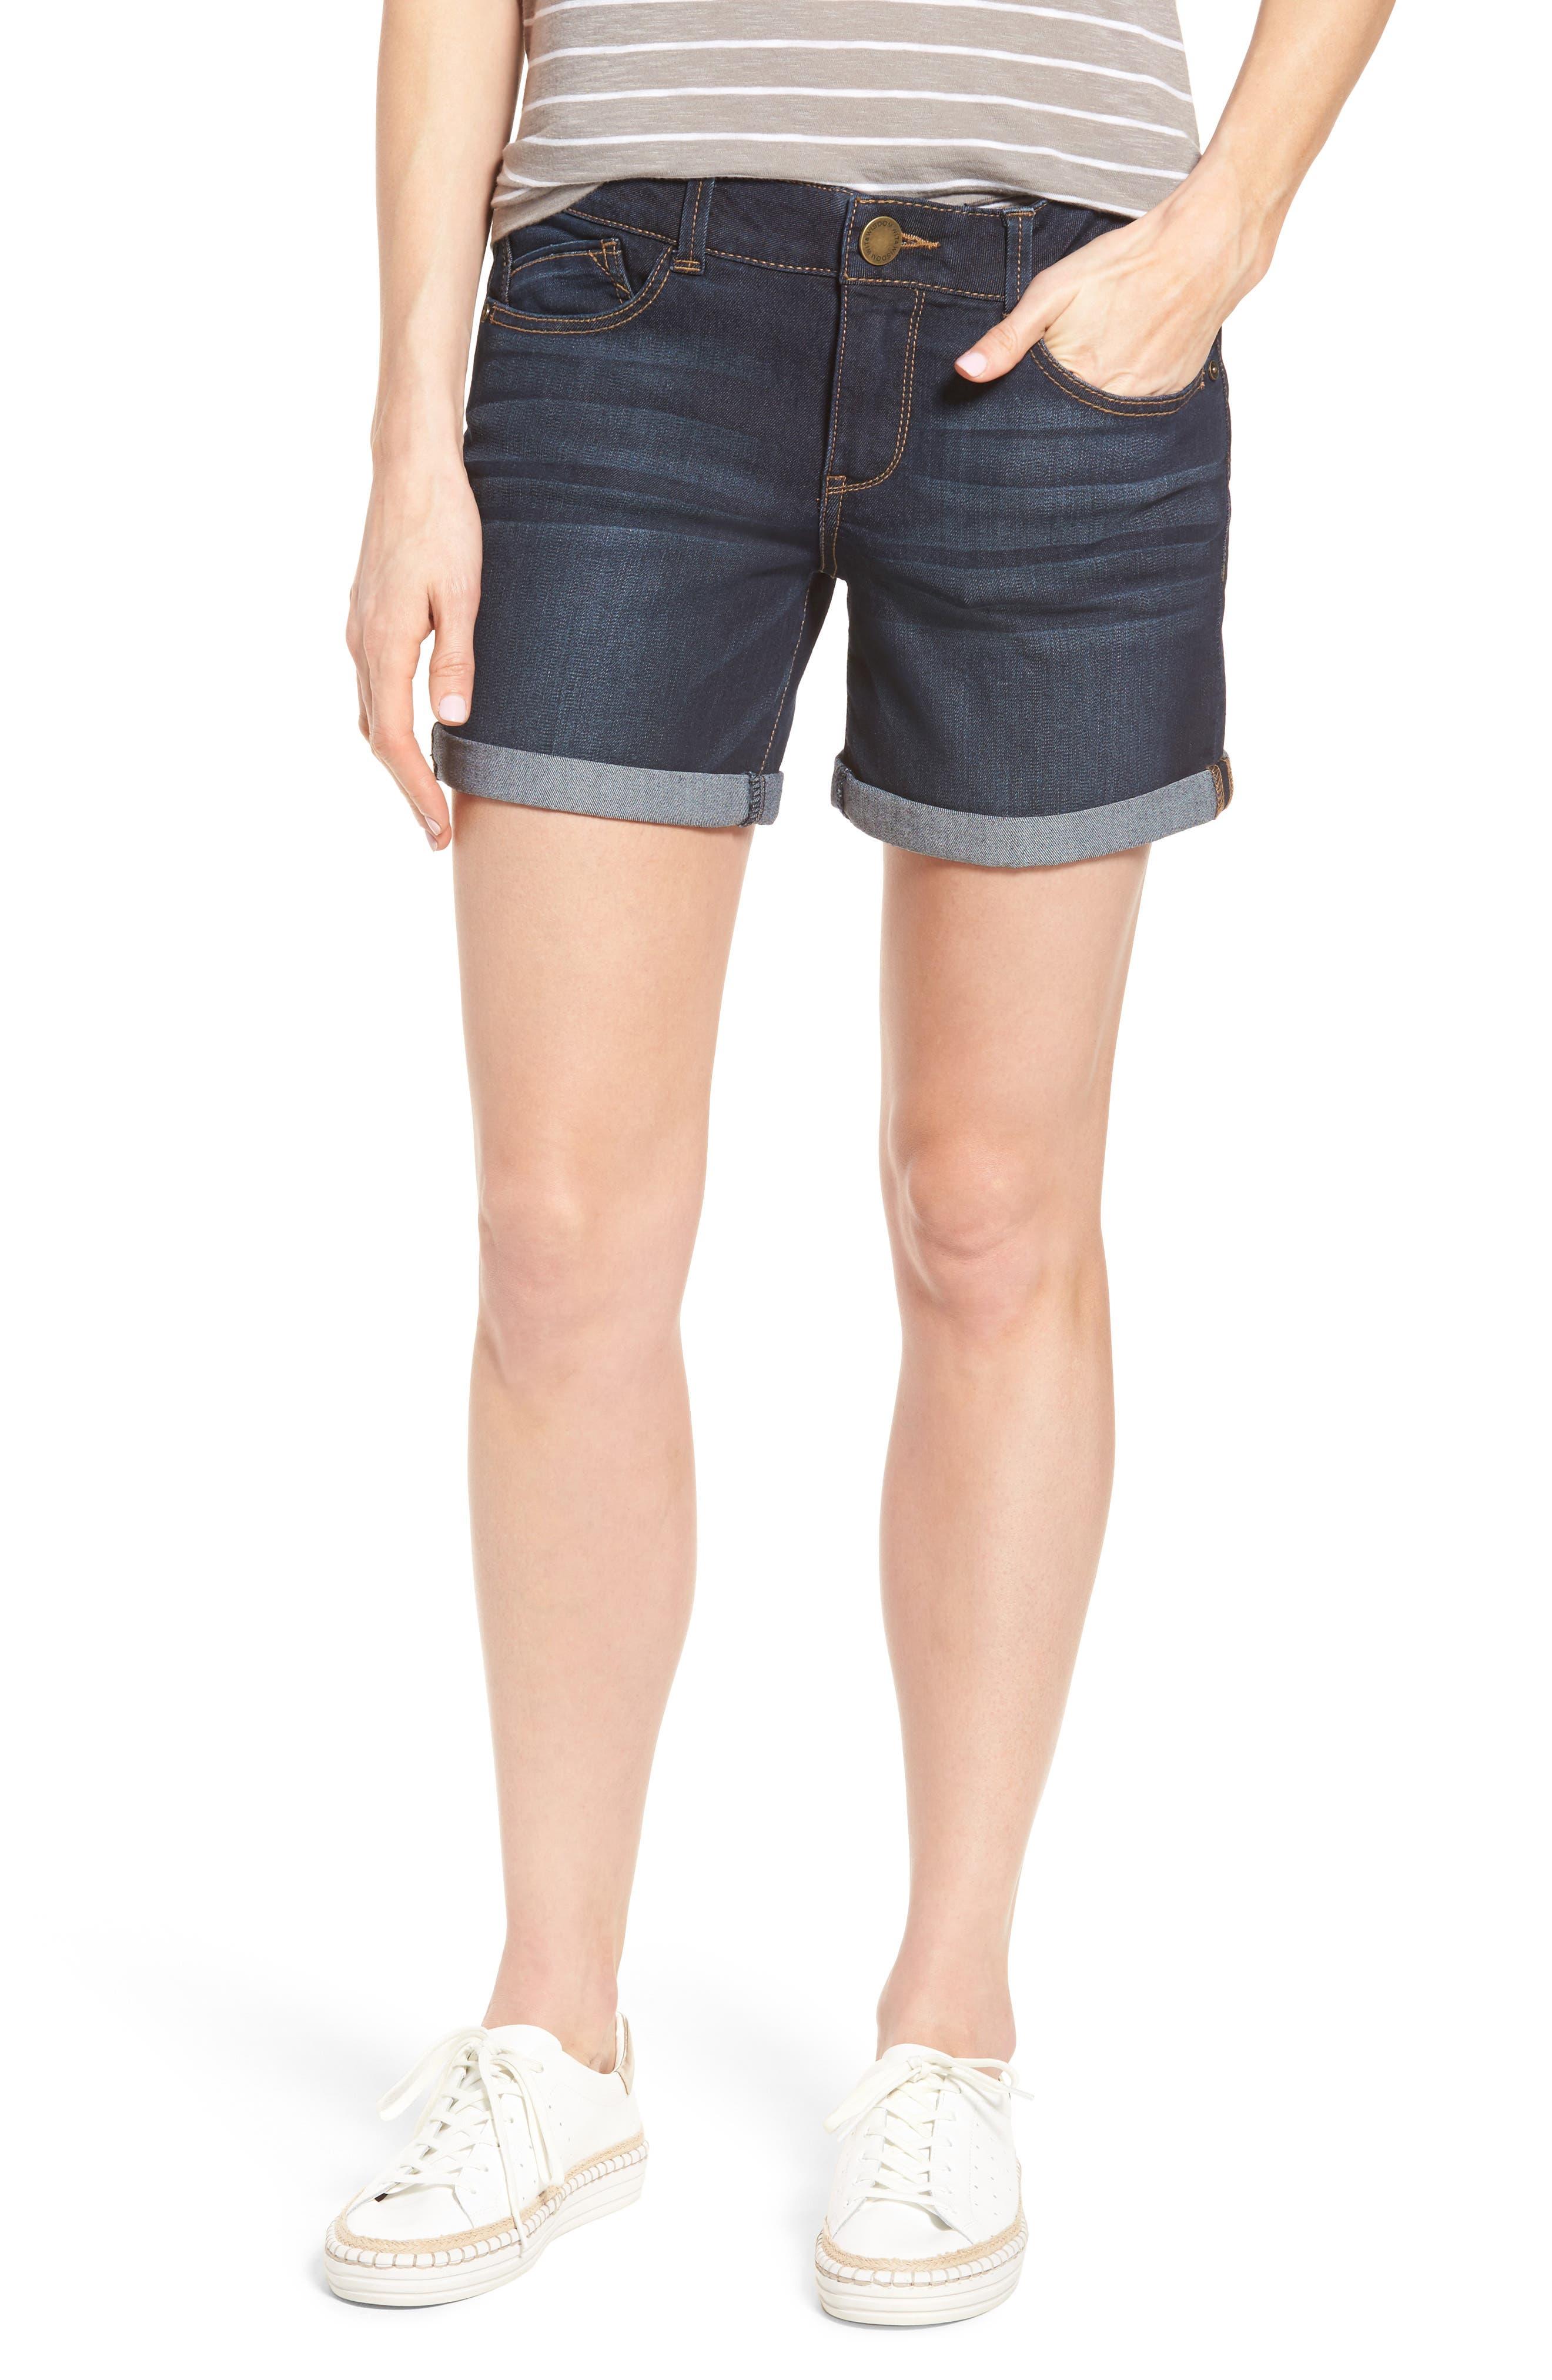 Ab-solution Cuffed Denim Shorts,                             Main thumbnail 1, color,                             402